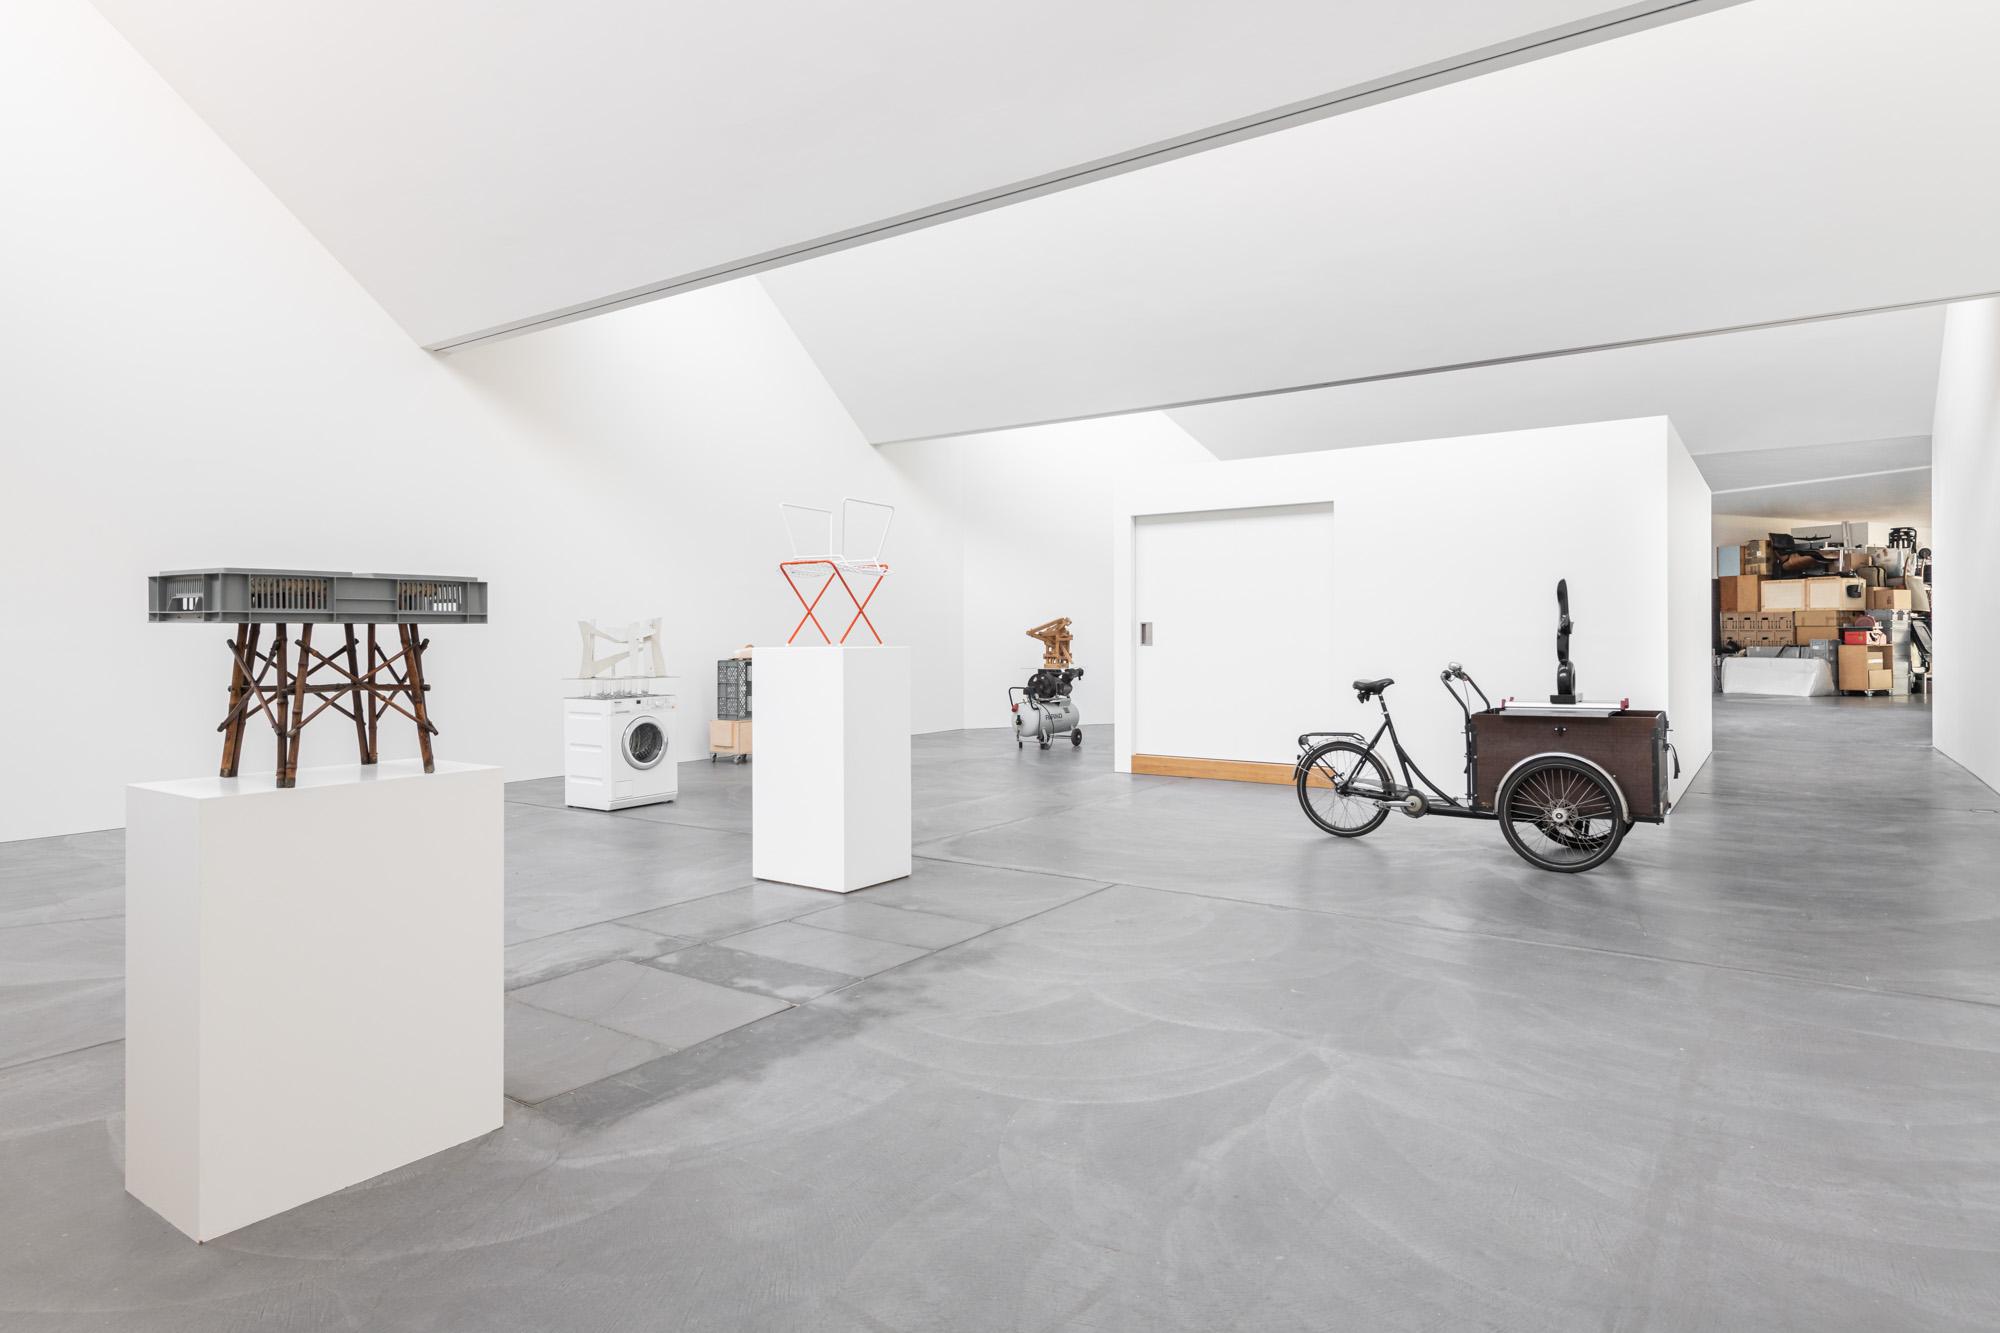 Exhibition: FLORIAN SLOTAWA